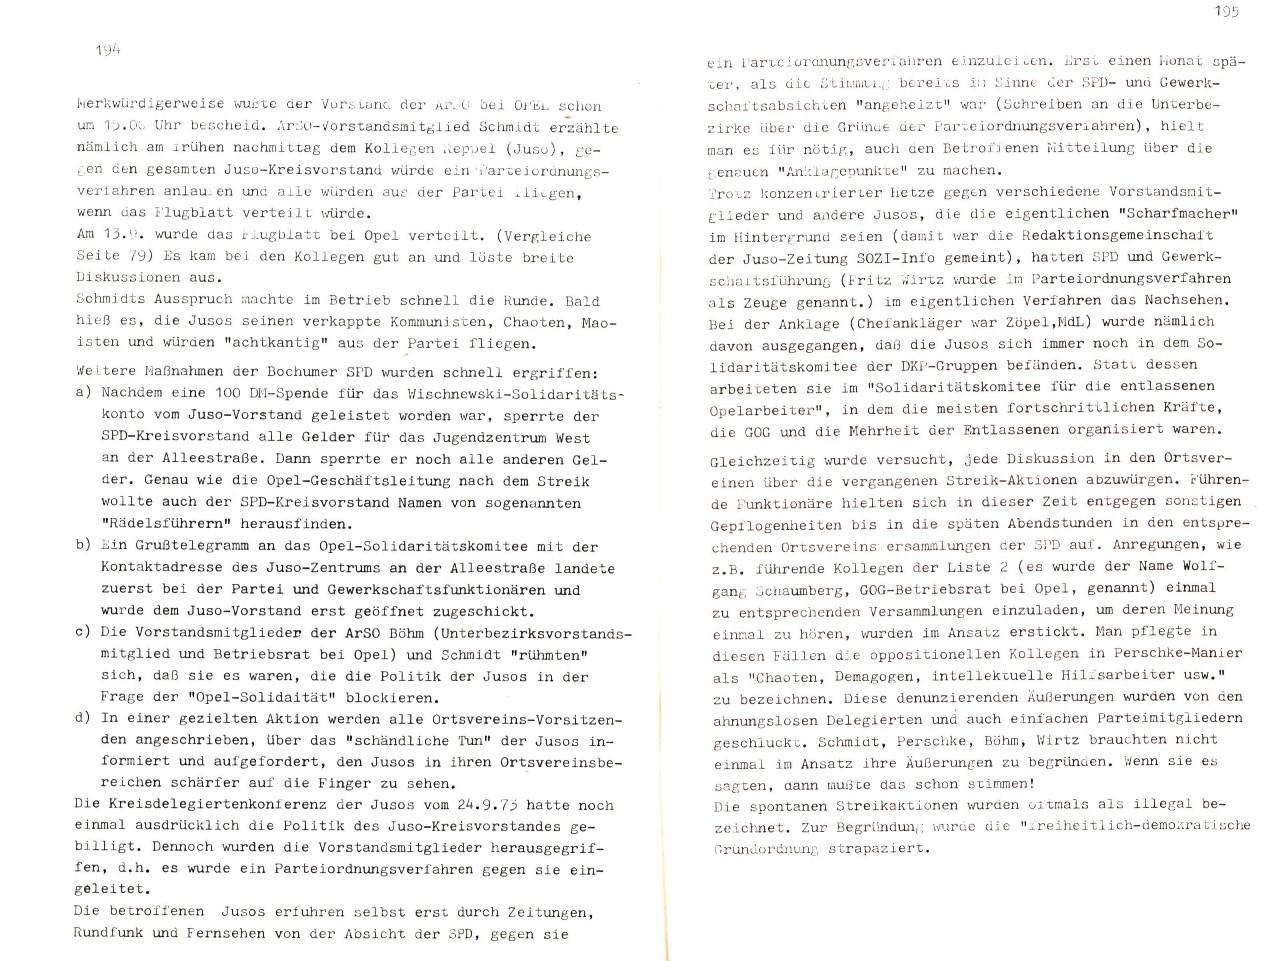 Bochum_IGM_Opel_PG_Opel_streikt_1973_100